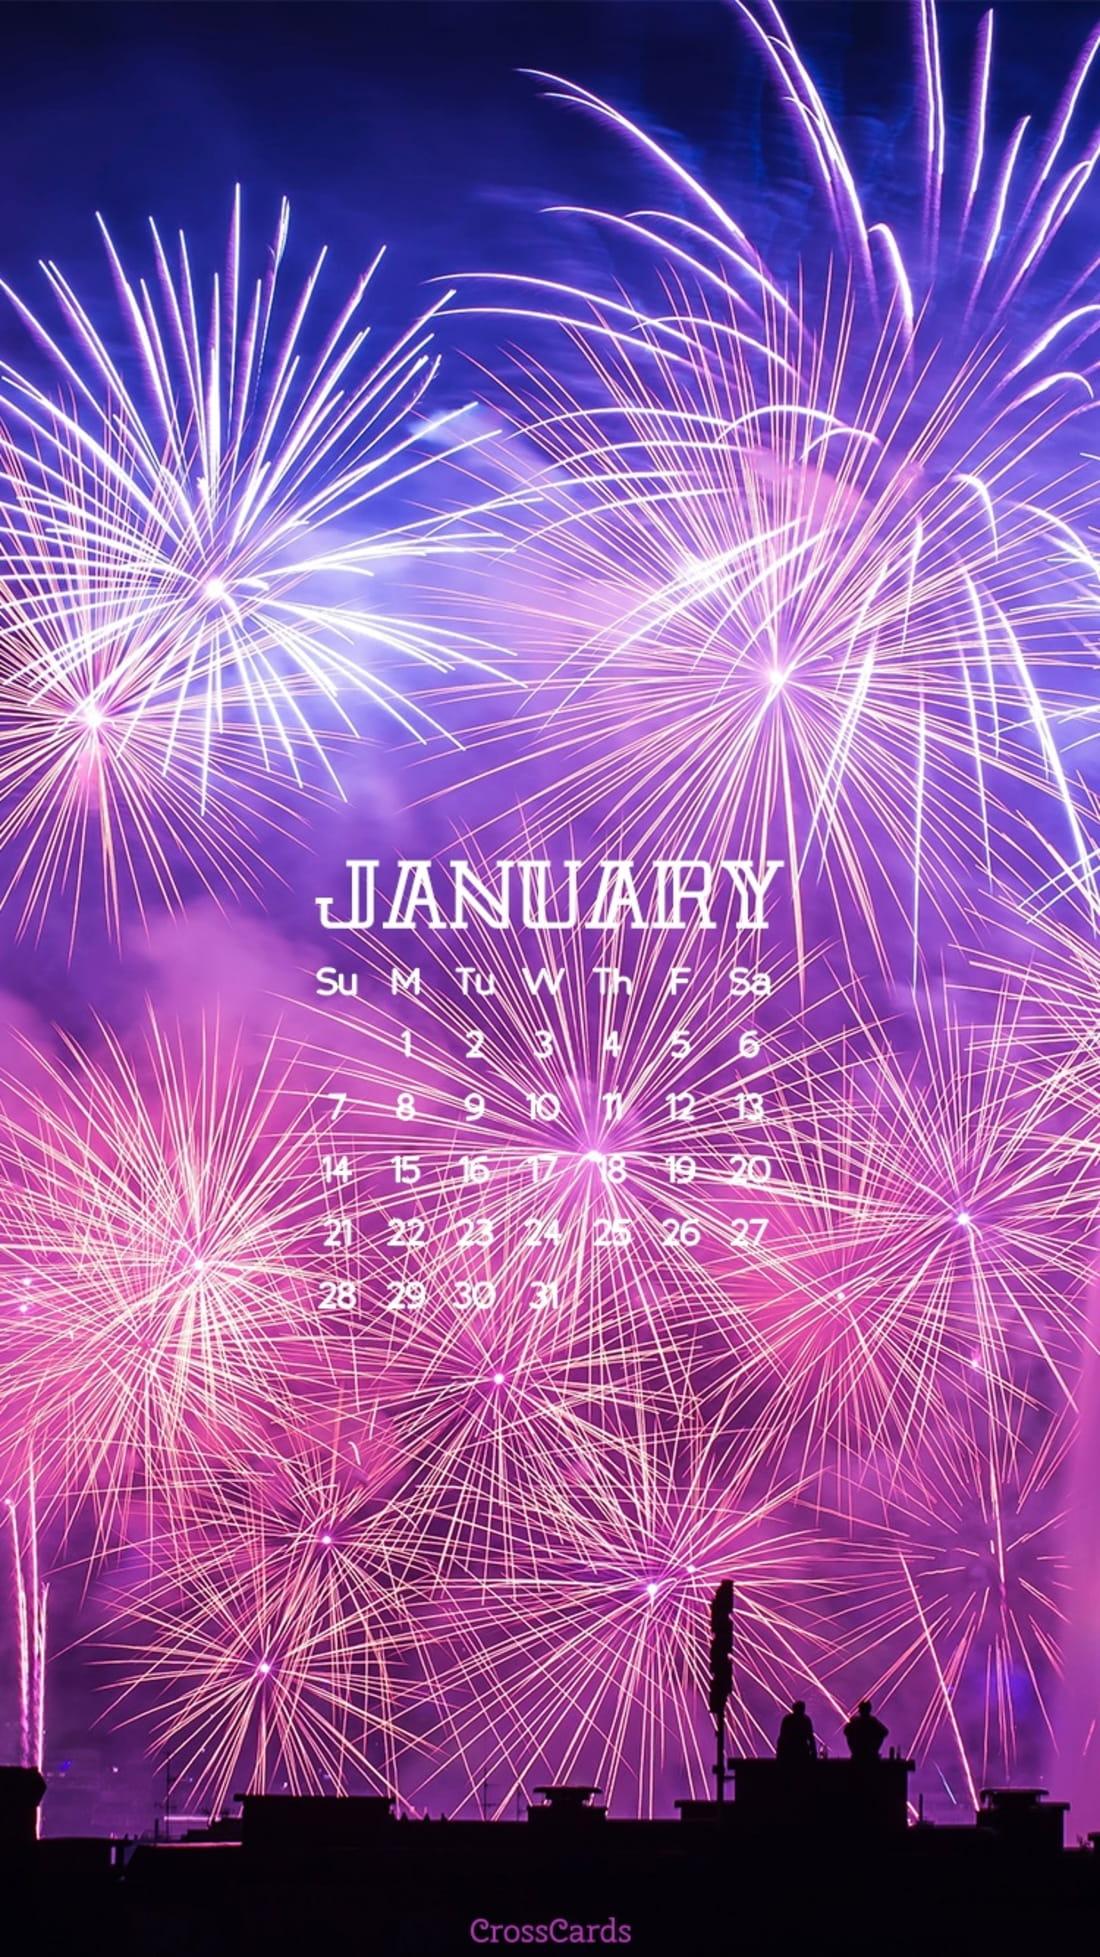 January 2018 - Fireworks mobile phone wallpaper